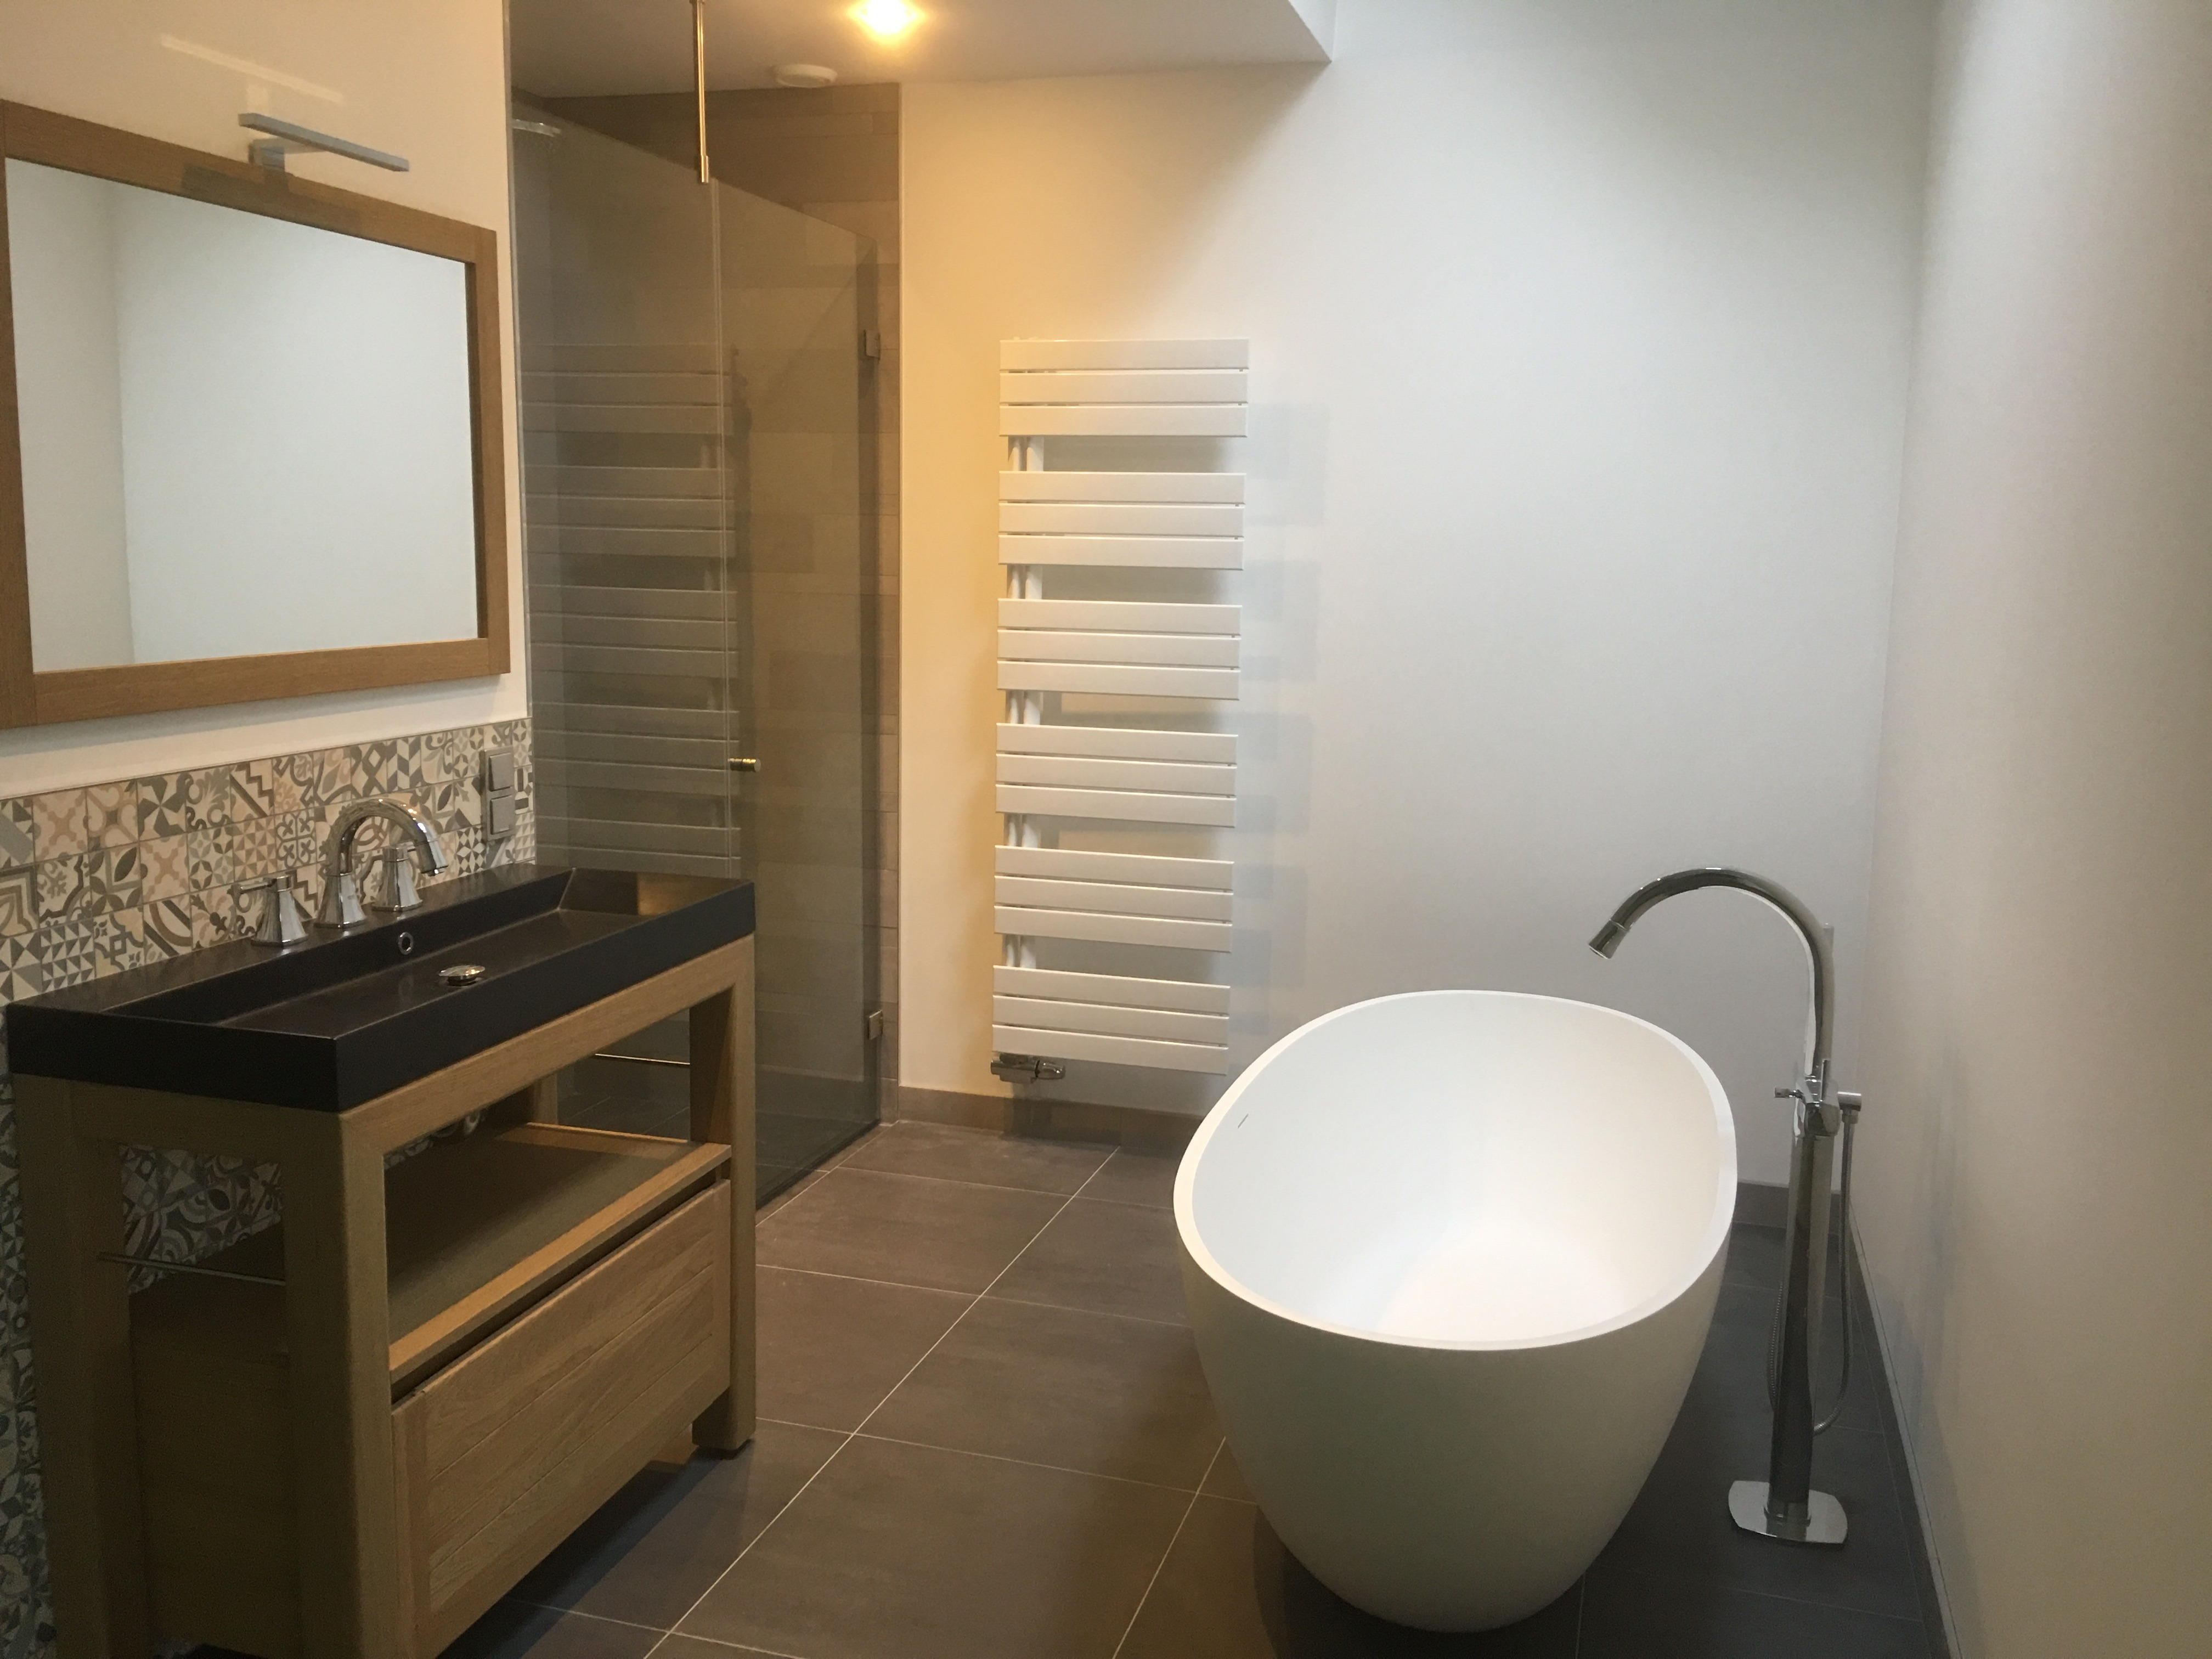 Badkamer Met Whirlpool : Badkamer dodewaard wiesenekker badkamerconcepten